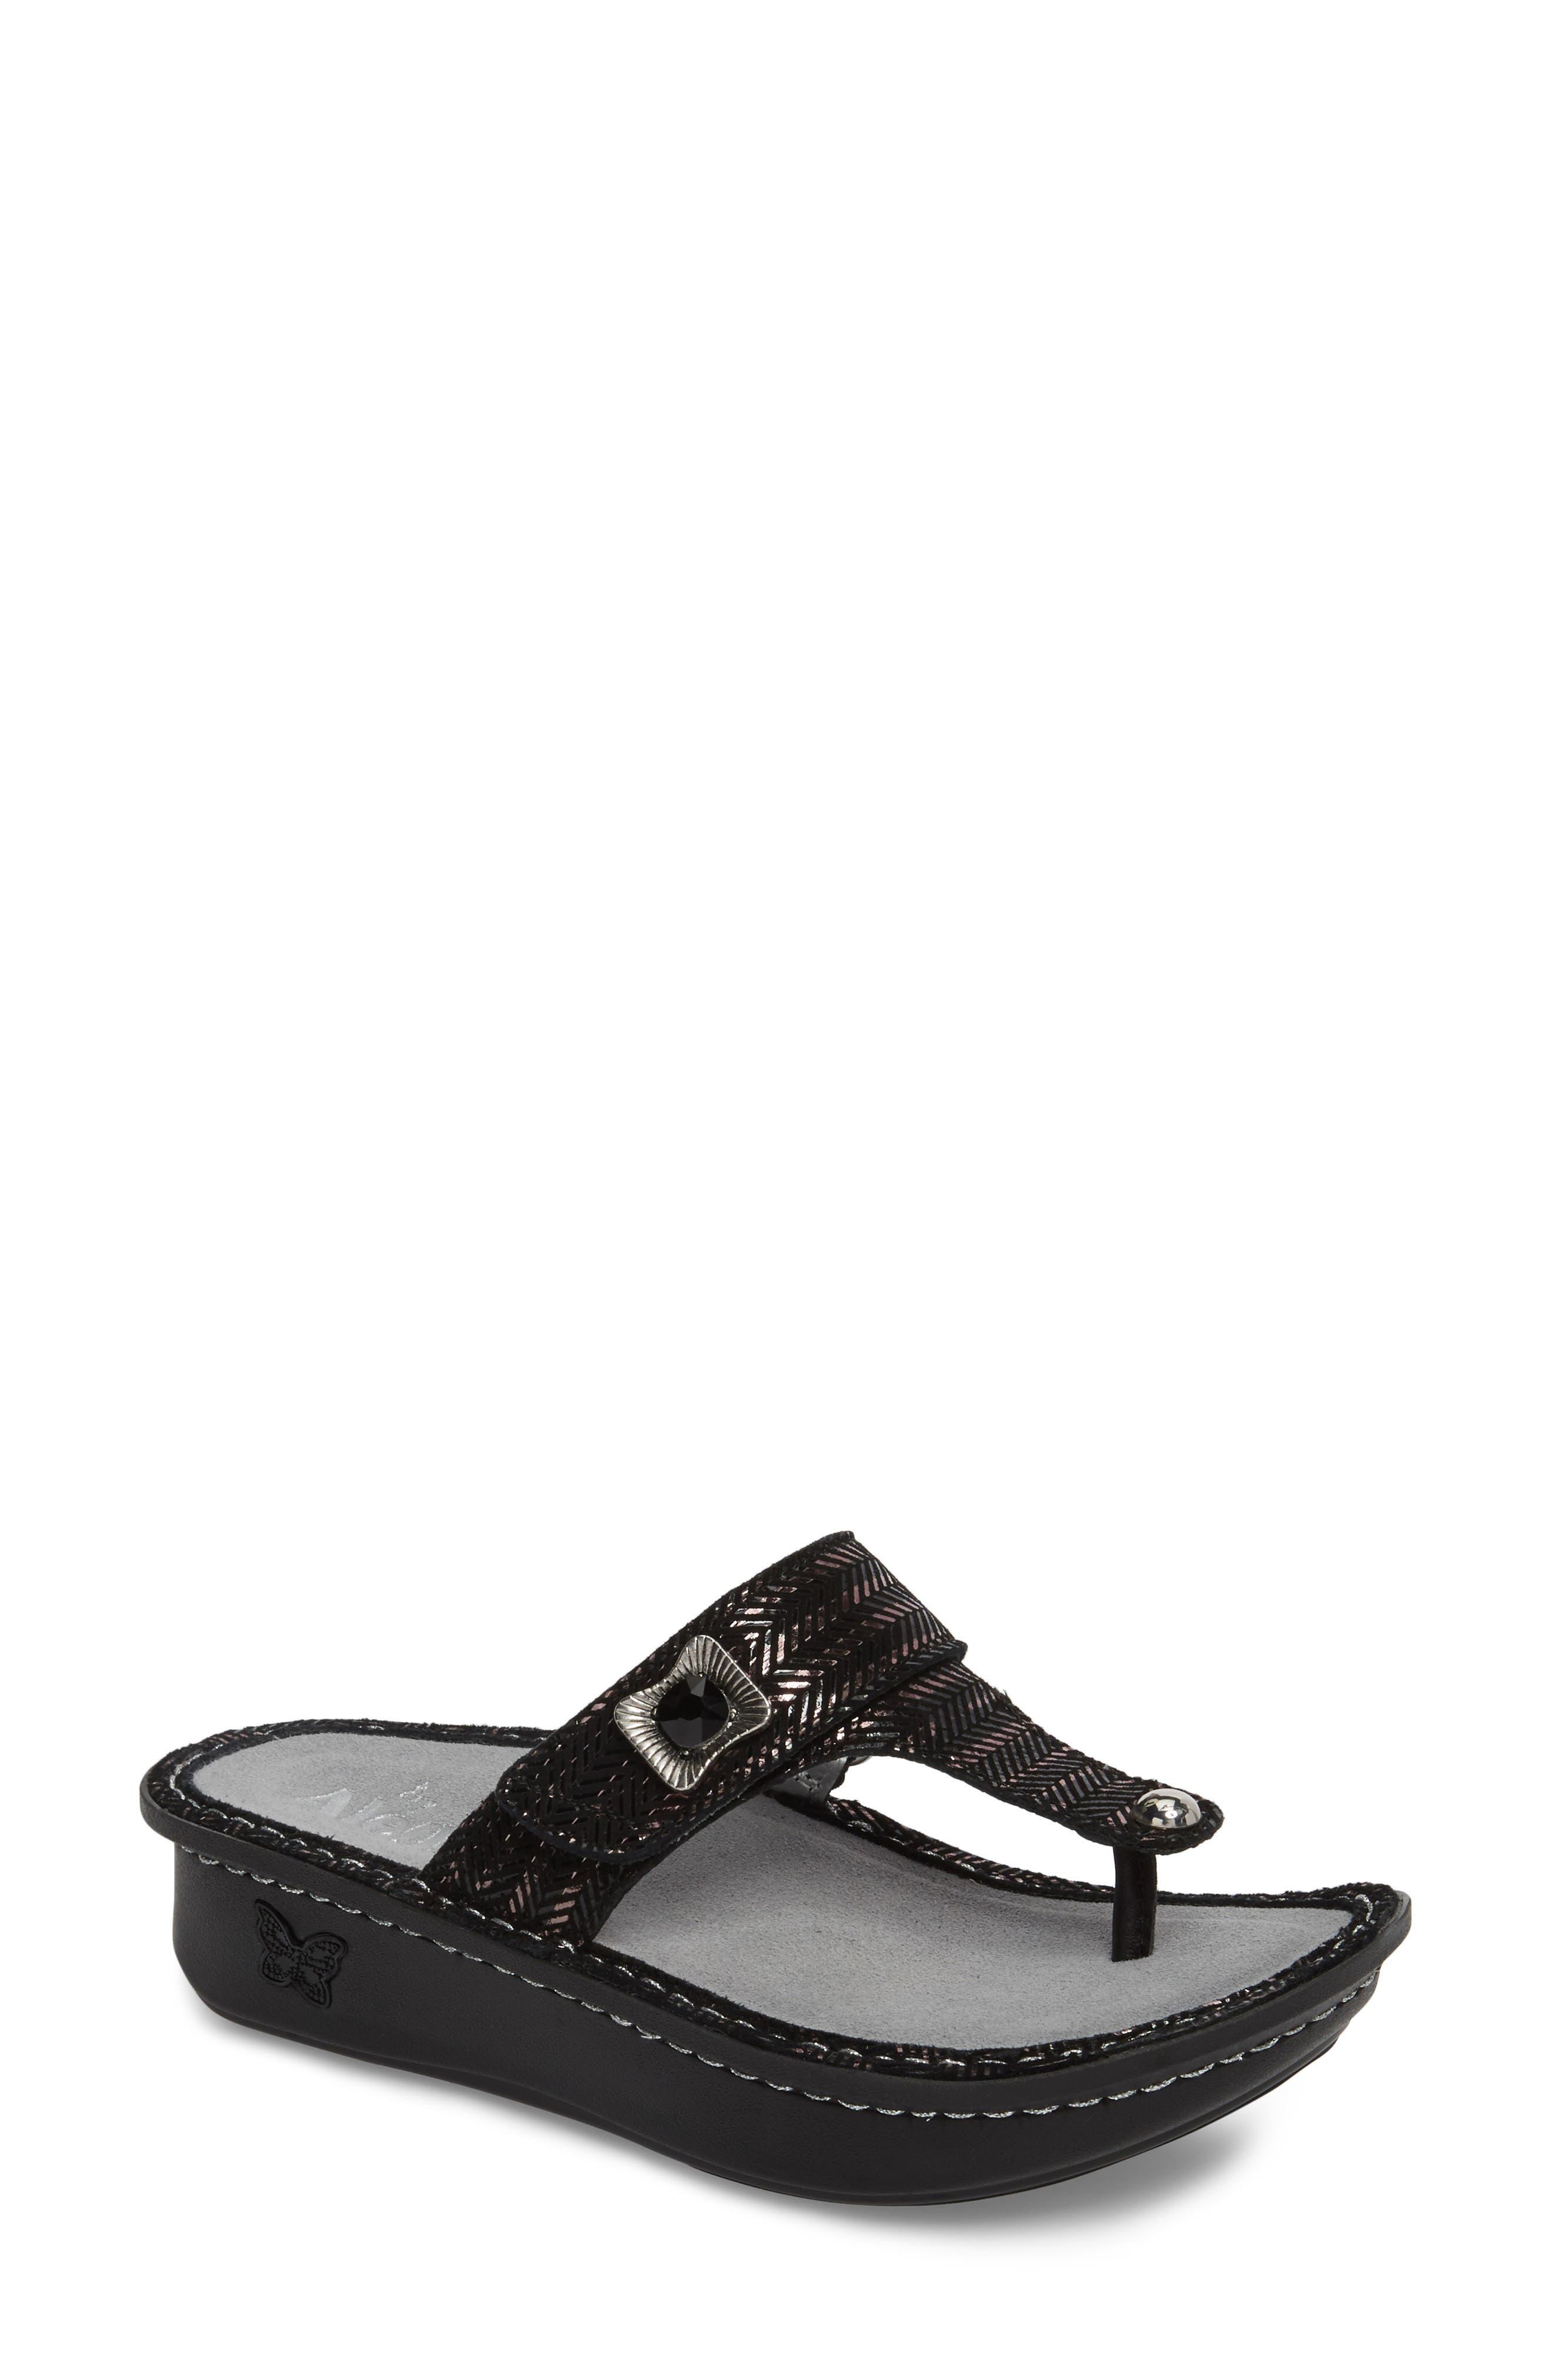 Women's Alegria 'Carina' Sandal